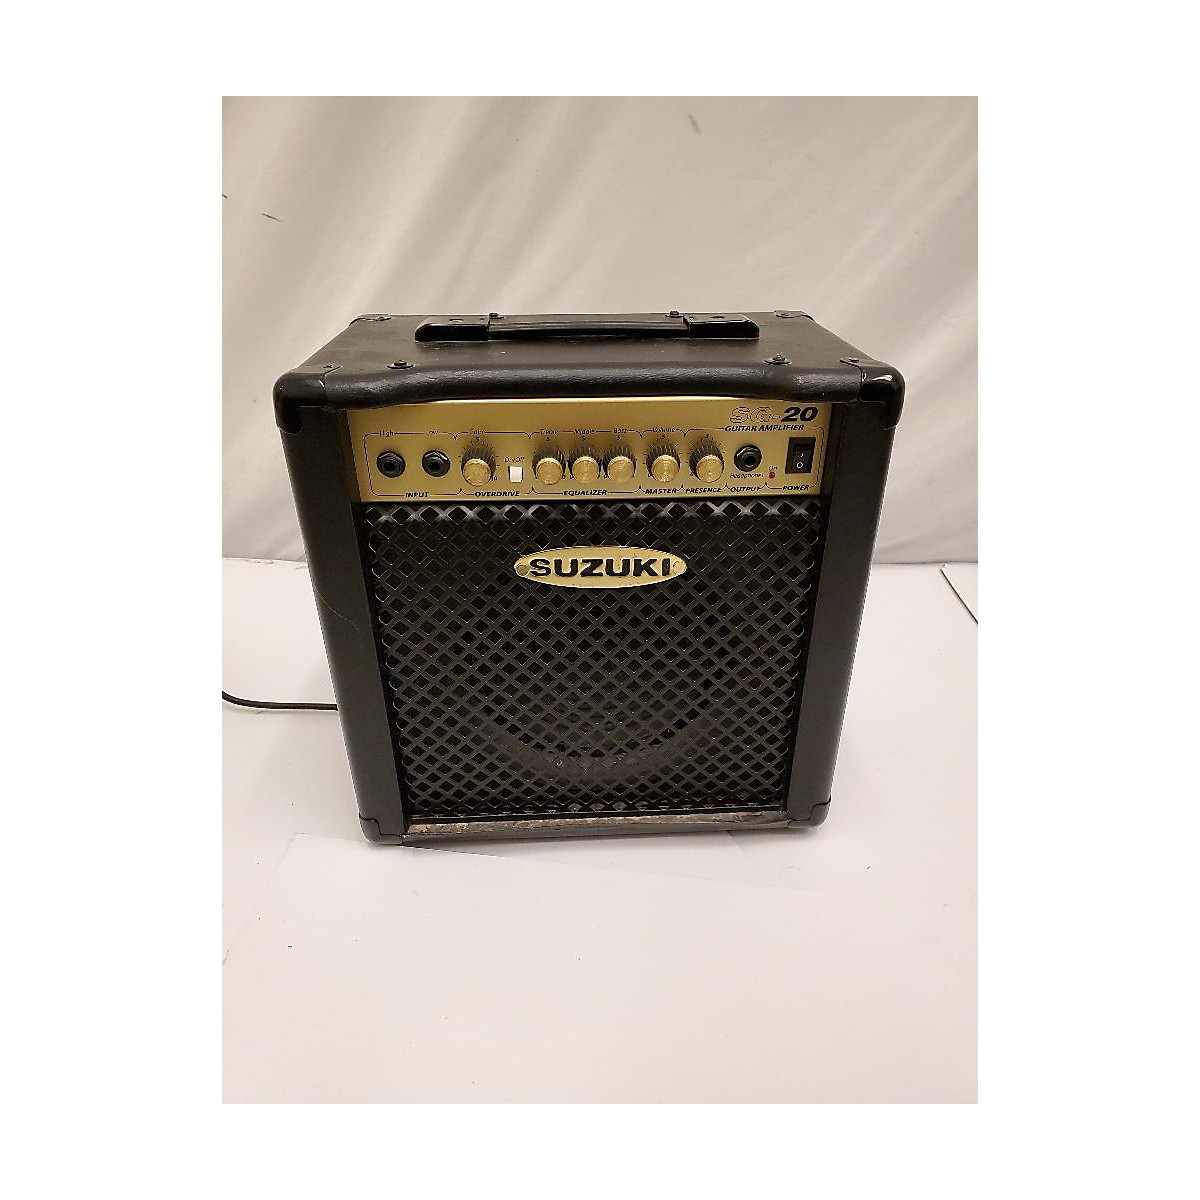 Suzuki SG20 Guitar Combo Amp